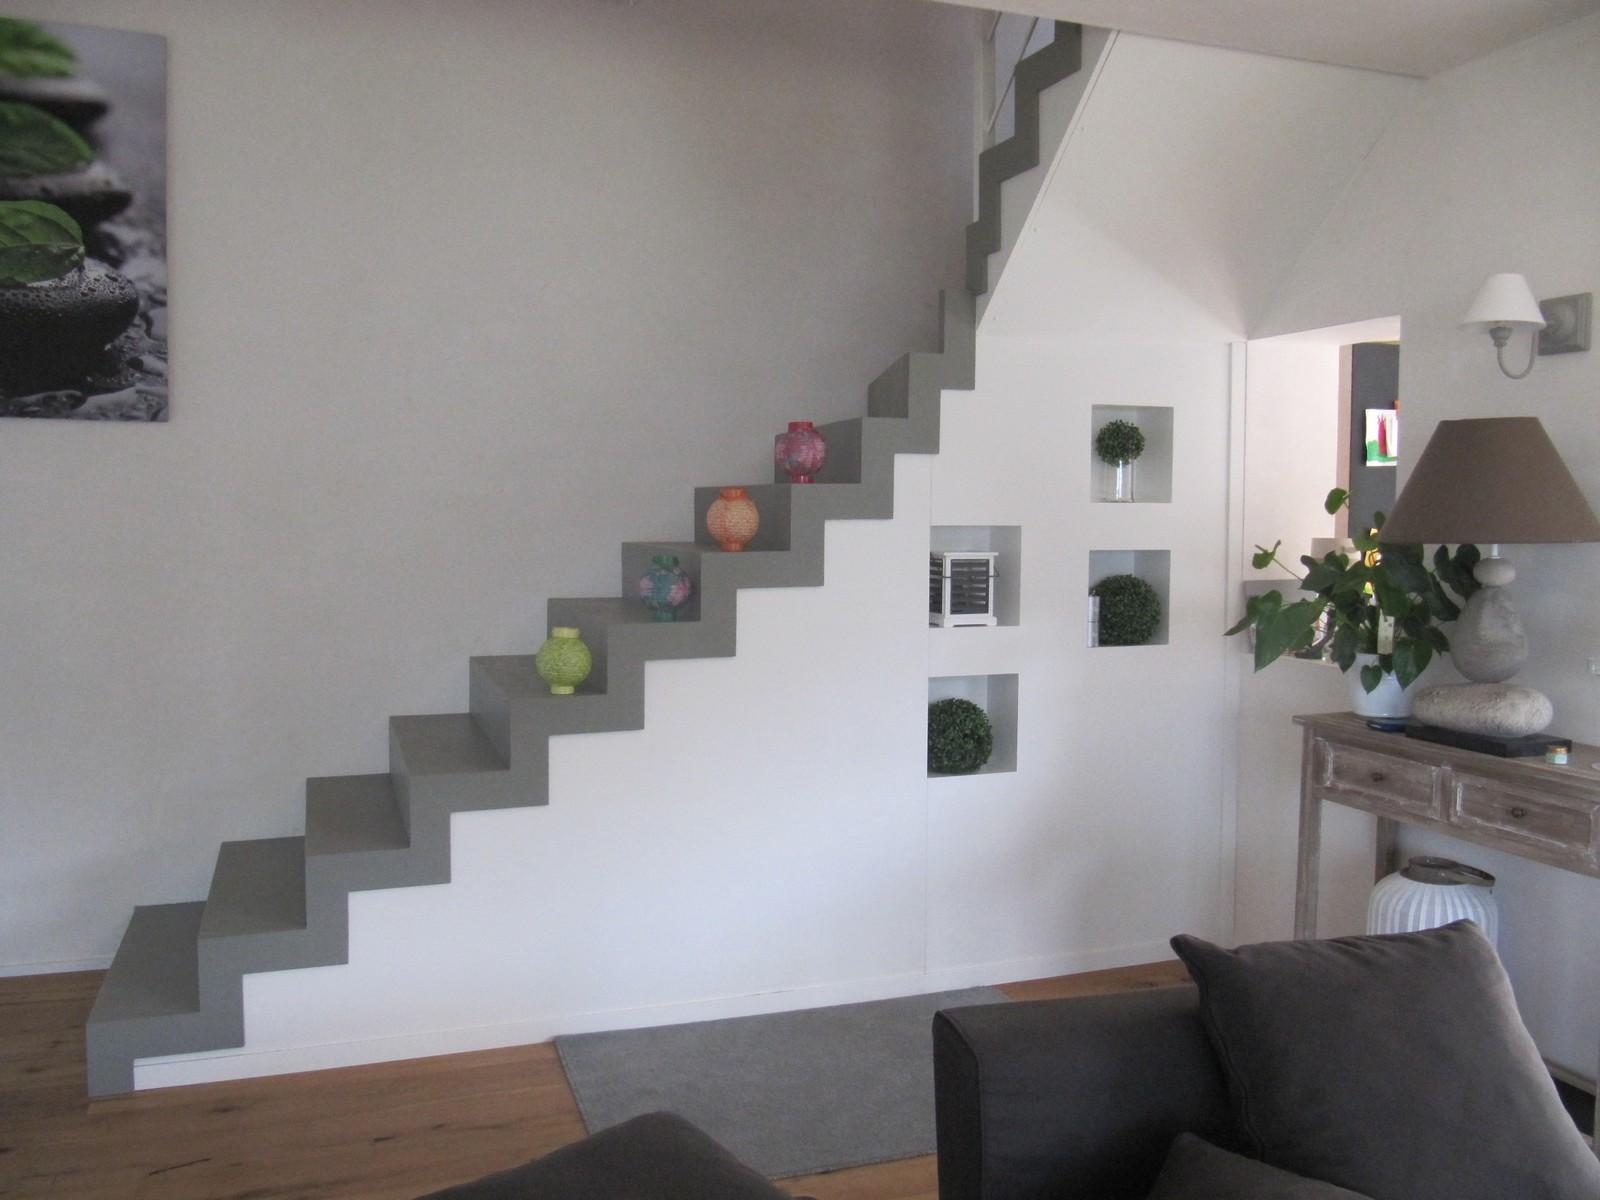 Escalier interieur beton escalier beton habillage bois for Emploi design interieur